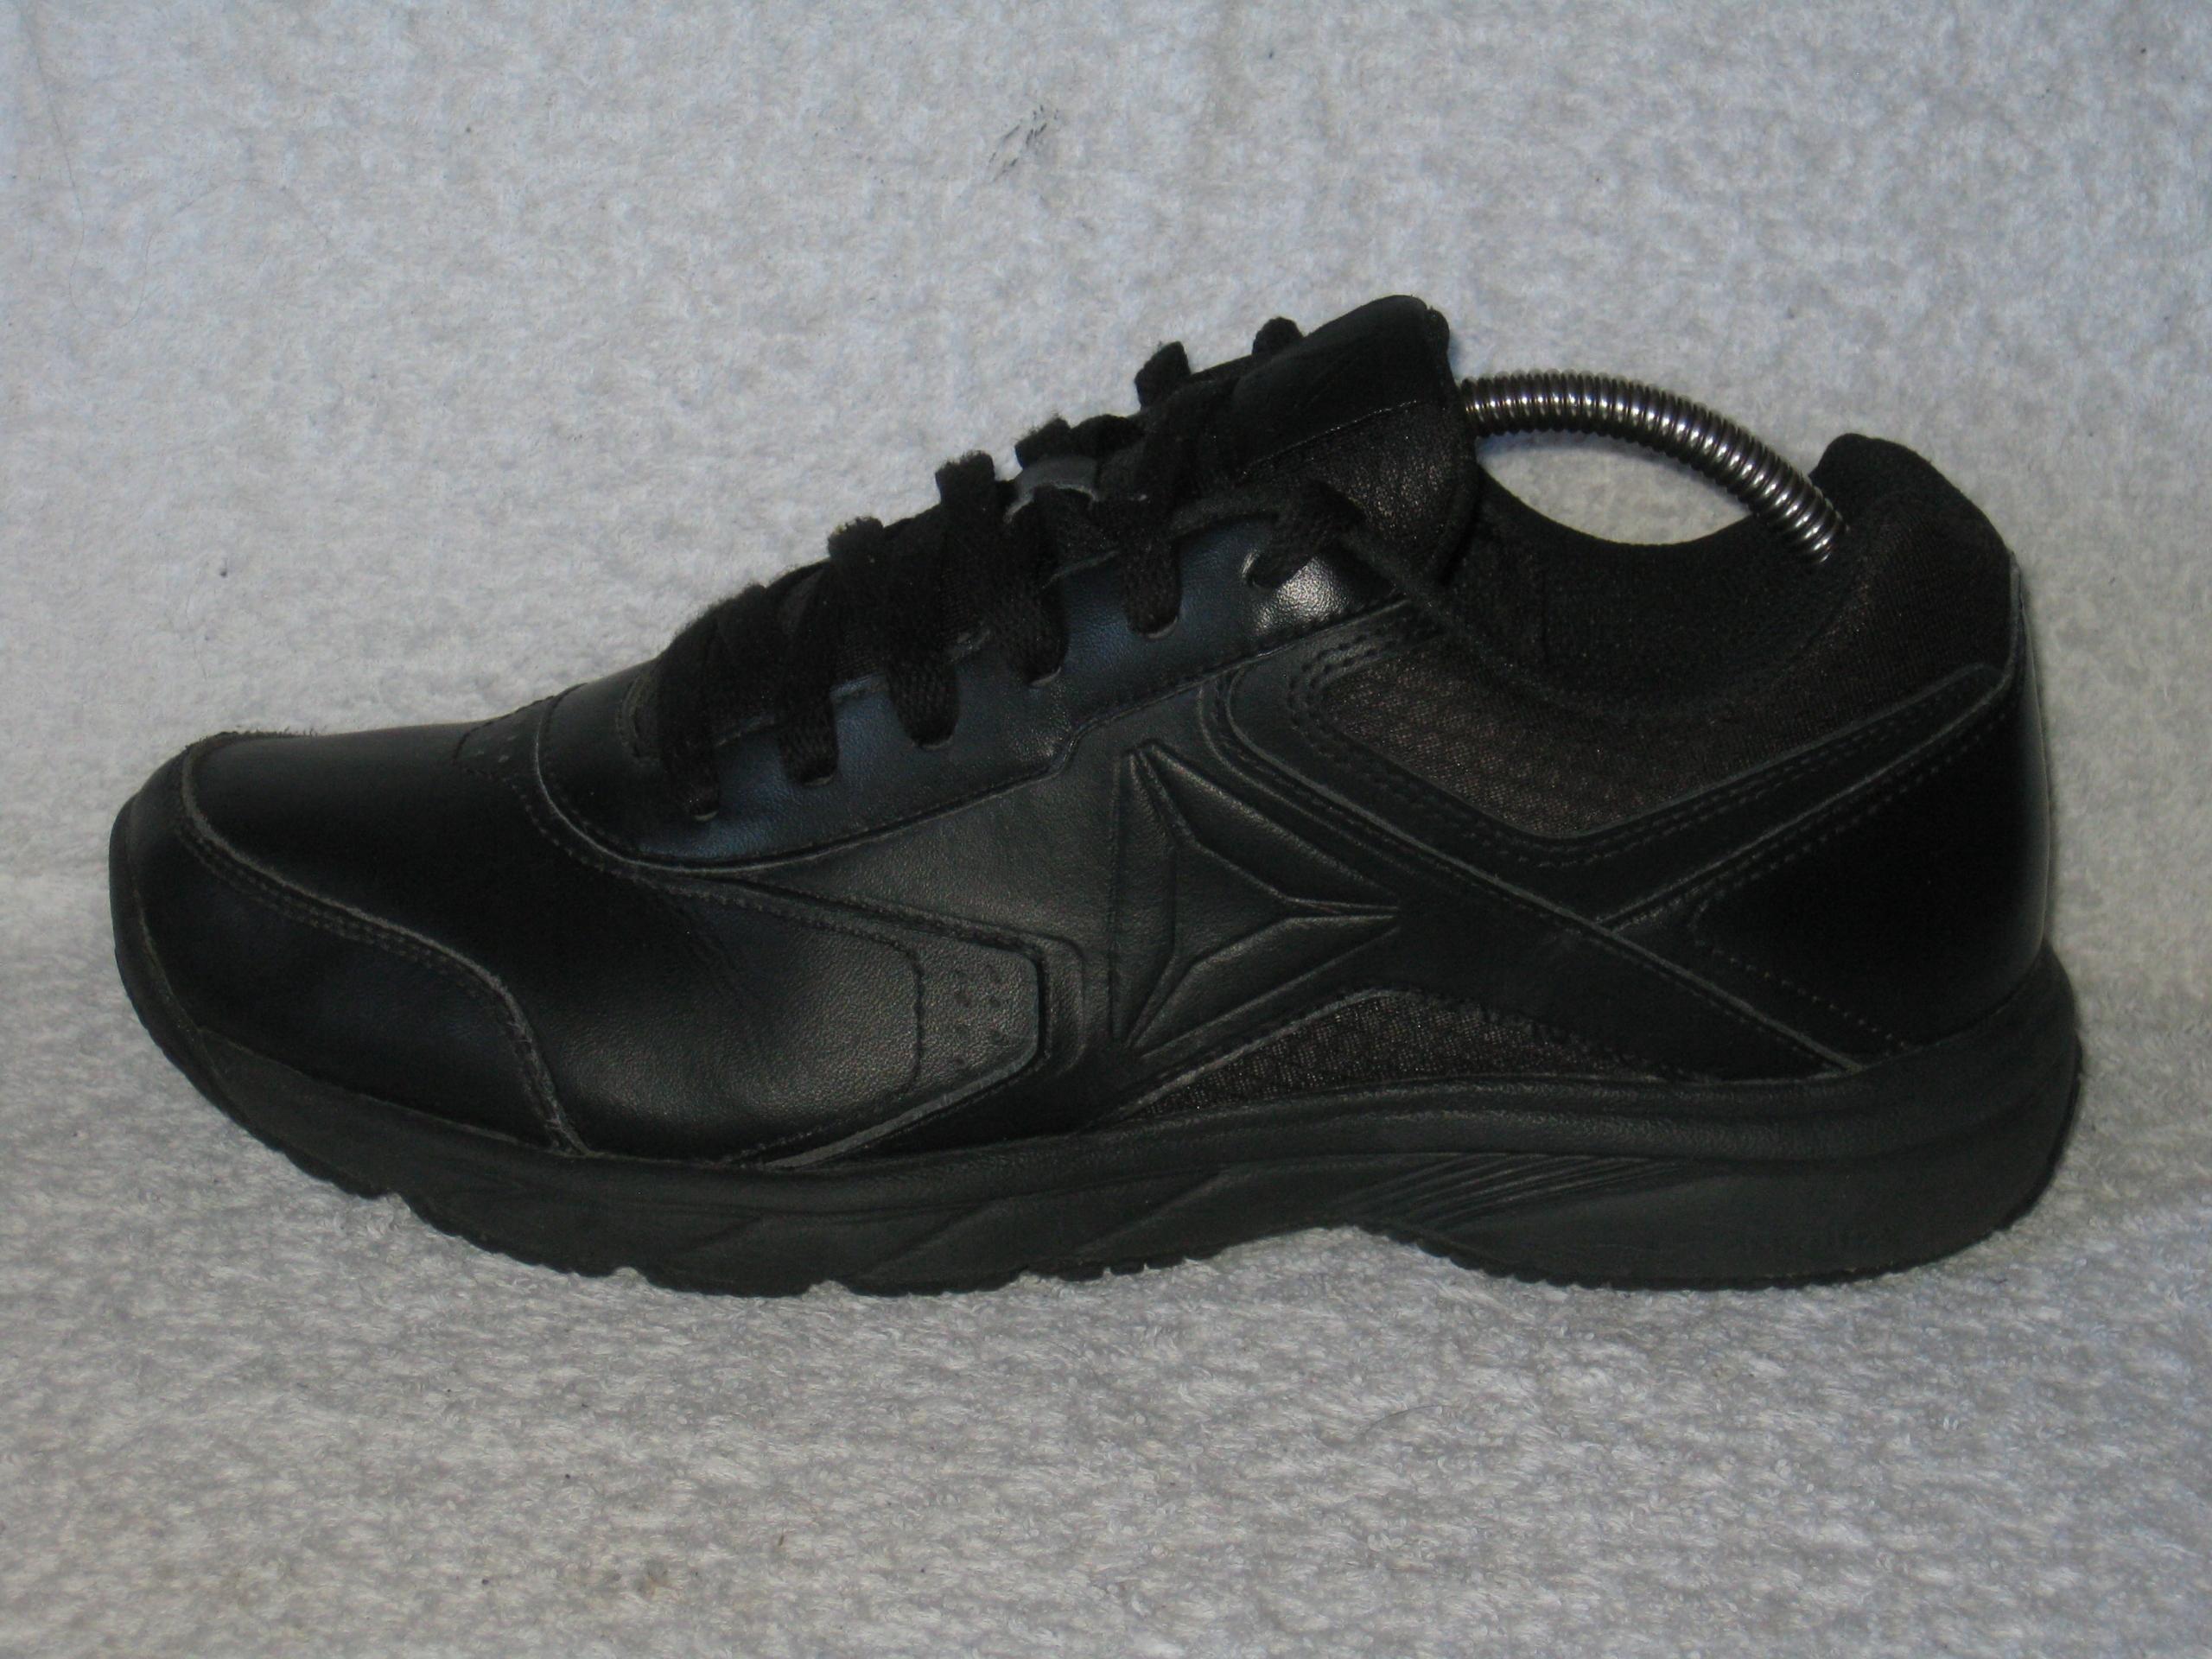 Reebok Men's Work N Cushion 3.0 Walking Shoe, BlackBlack